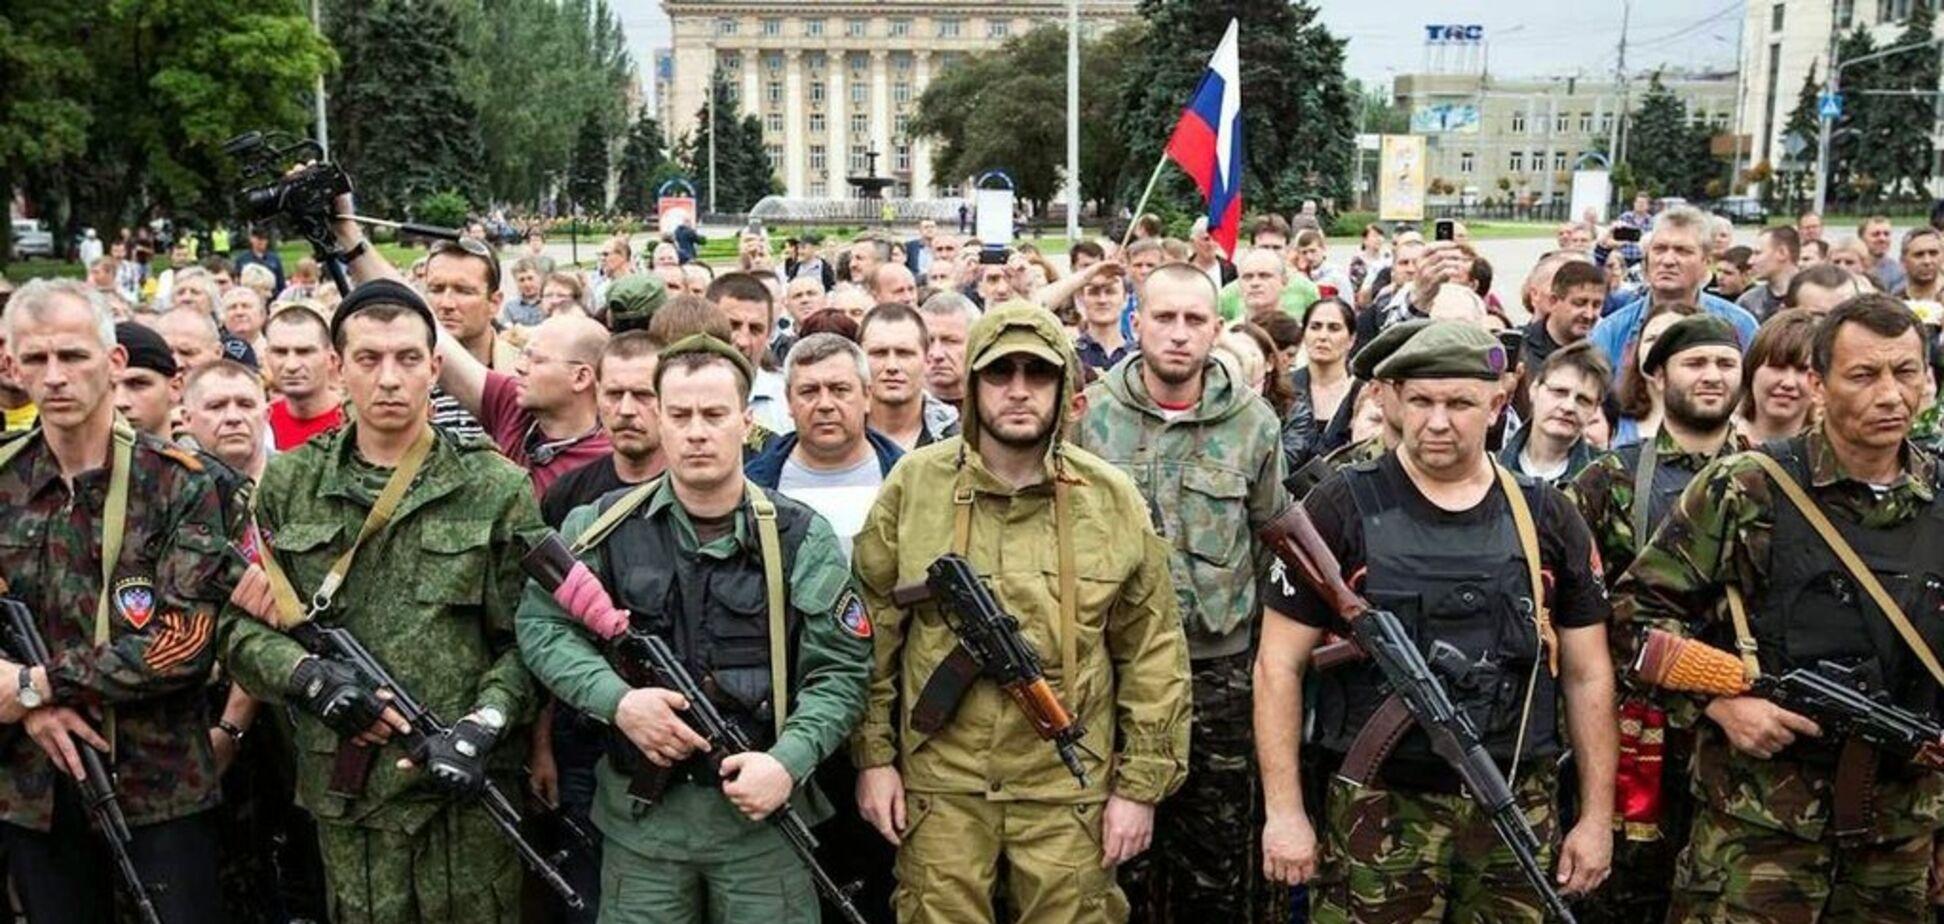 Поребрик News: Украине пригрозили походом террористов на Киев